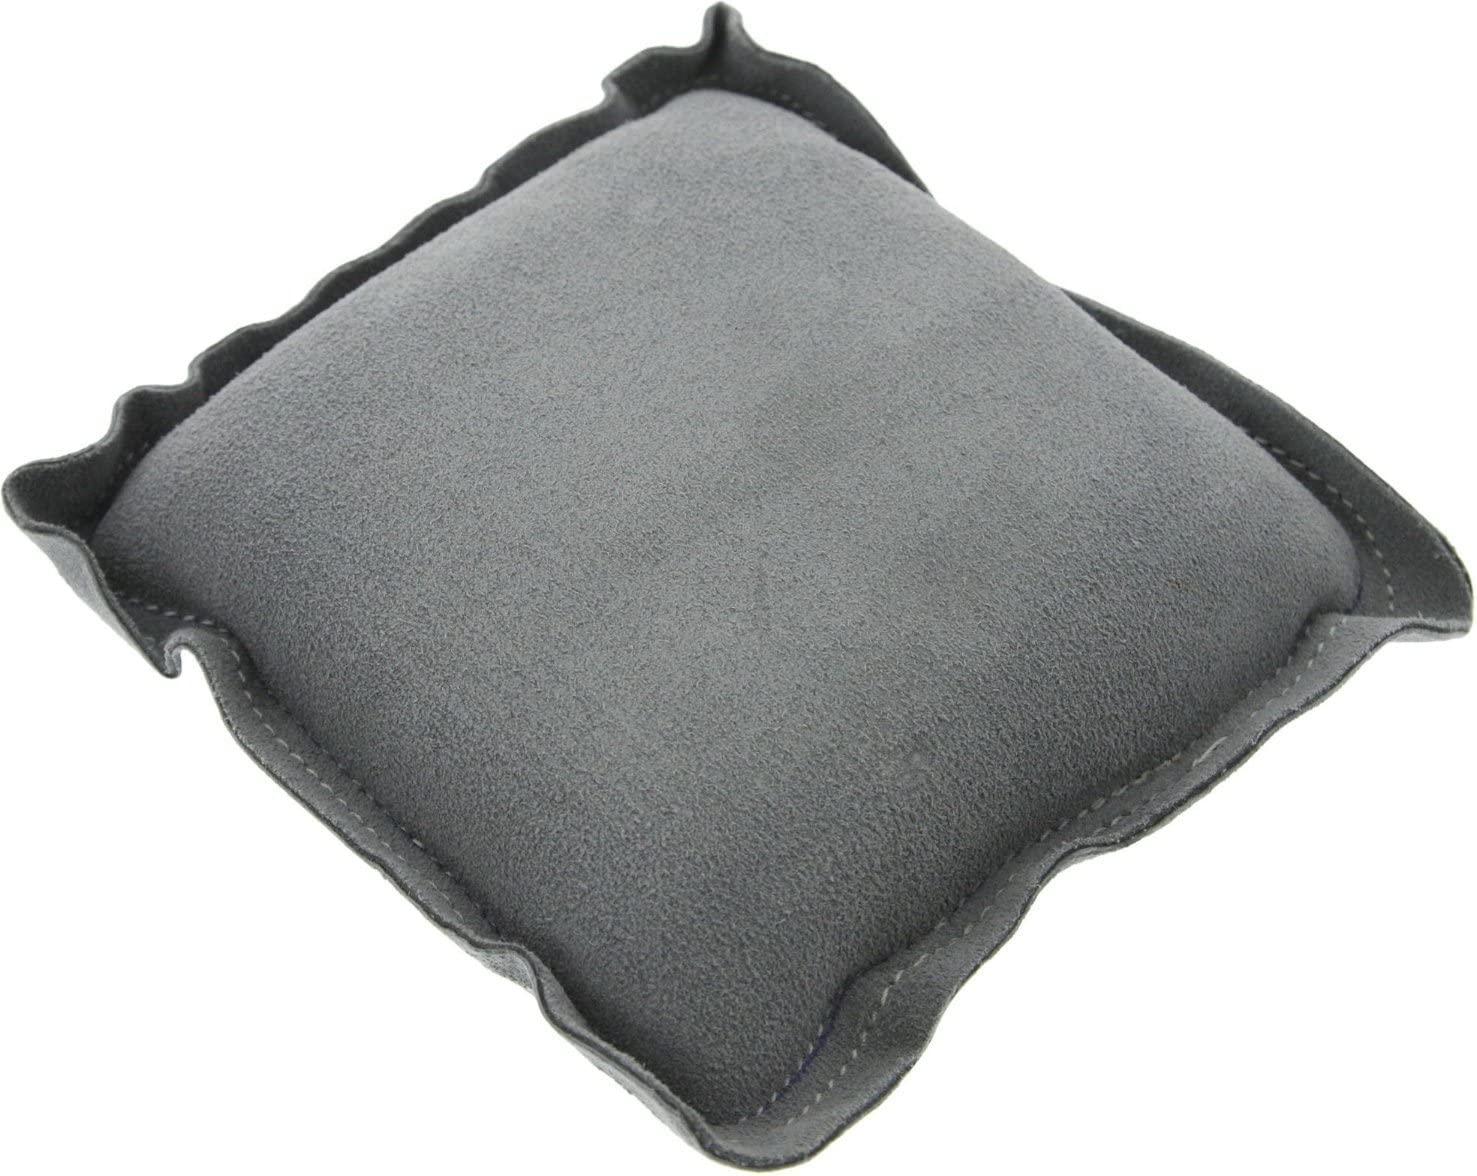 SE JT-SB58 7 Square Leather Bench Block Sand Pad